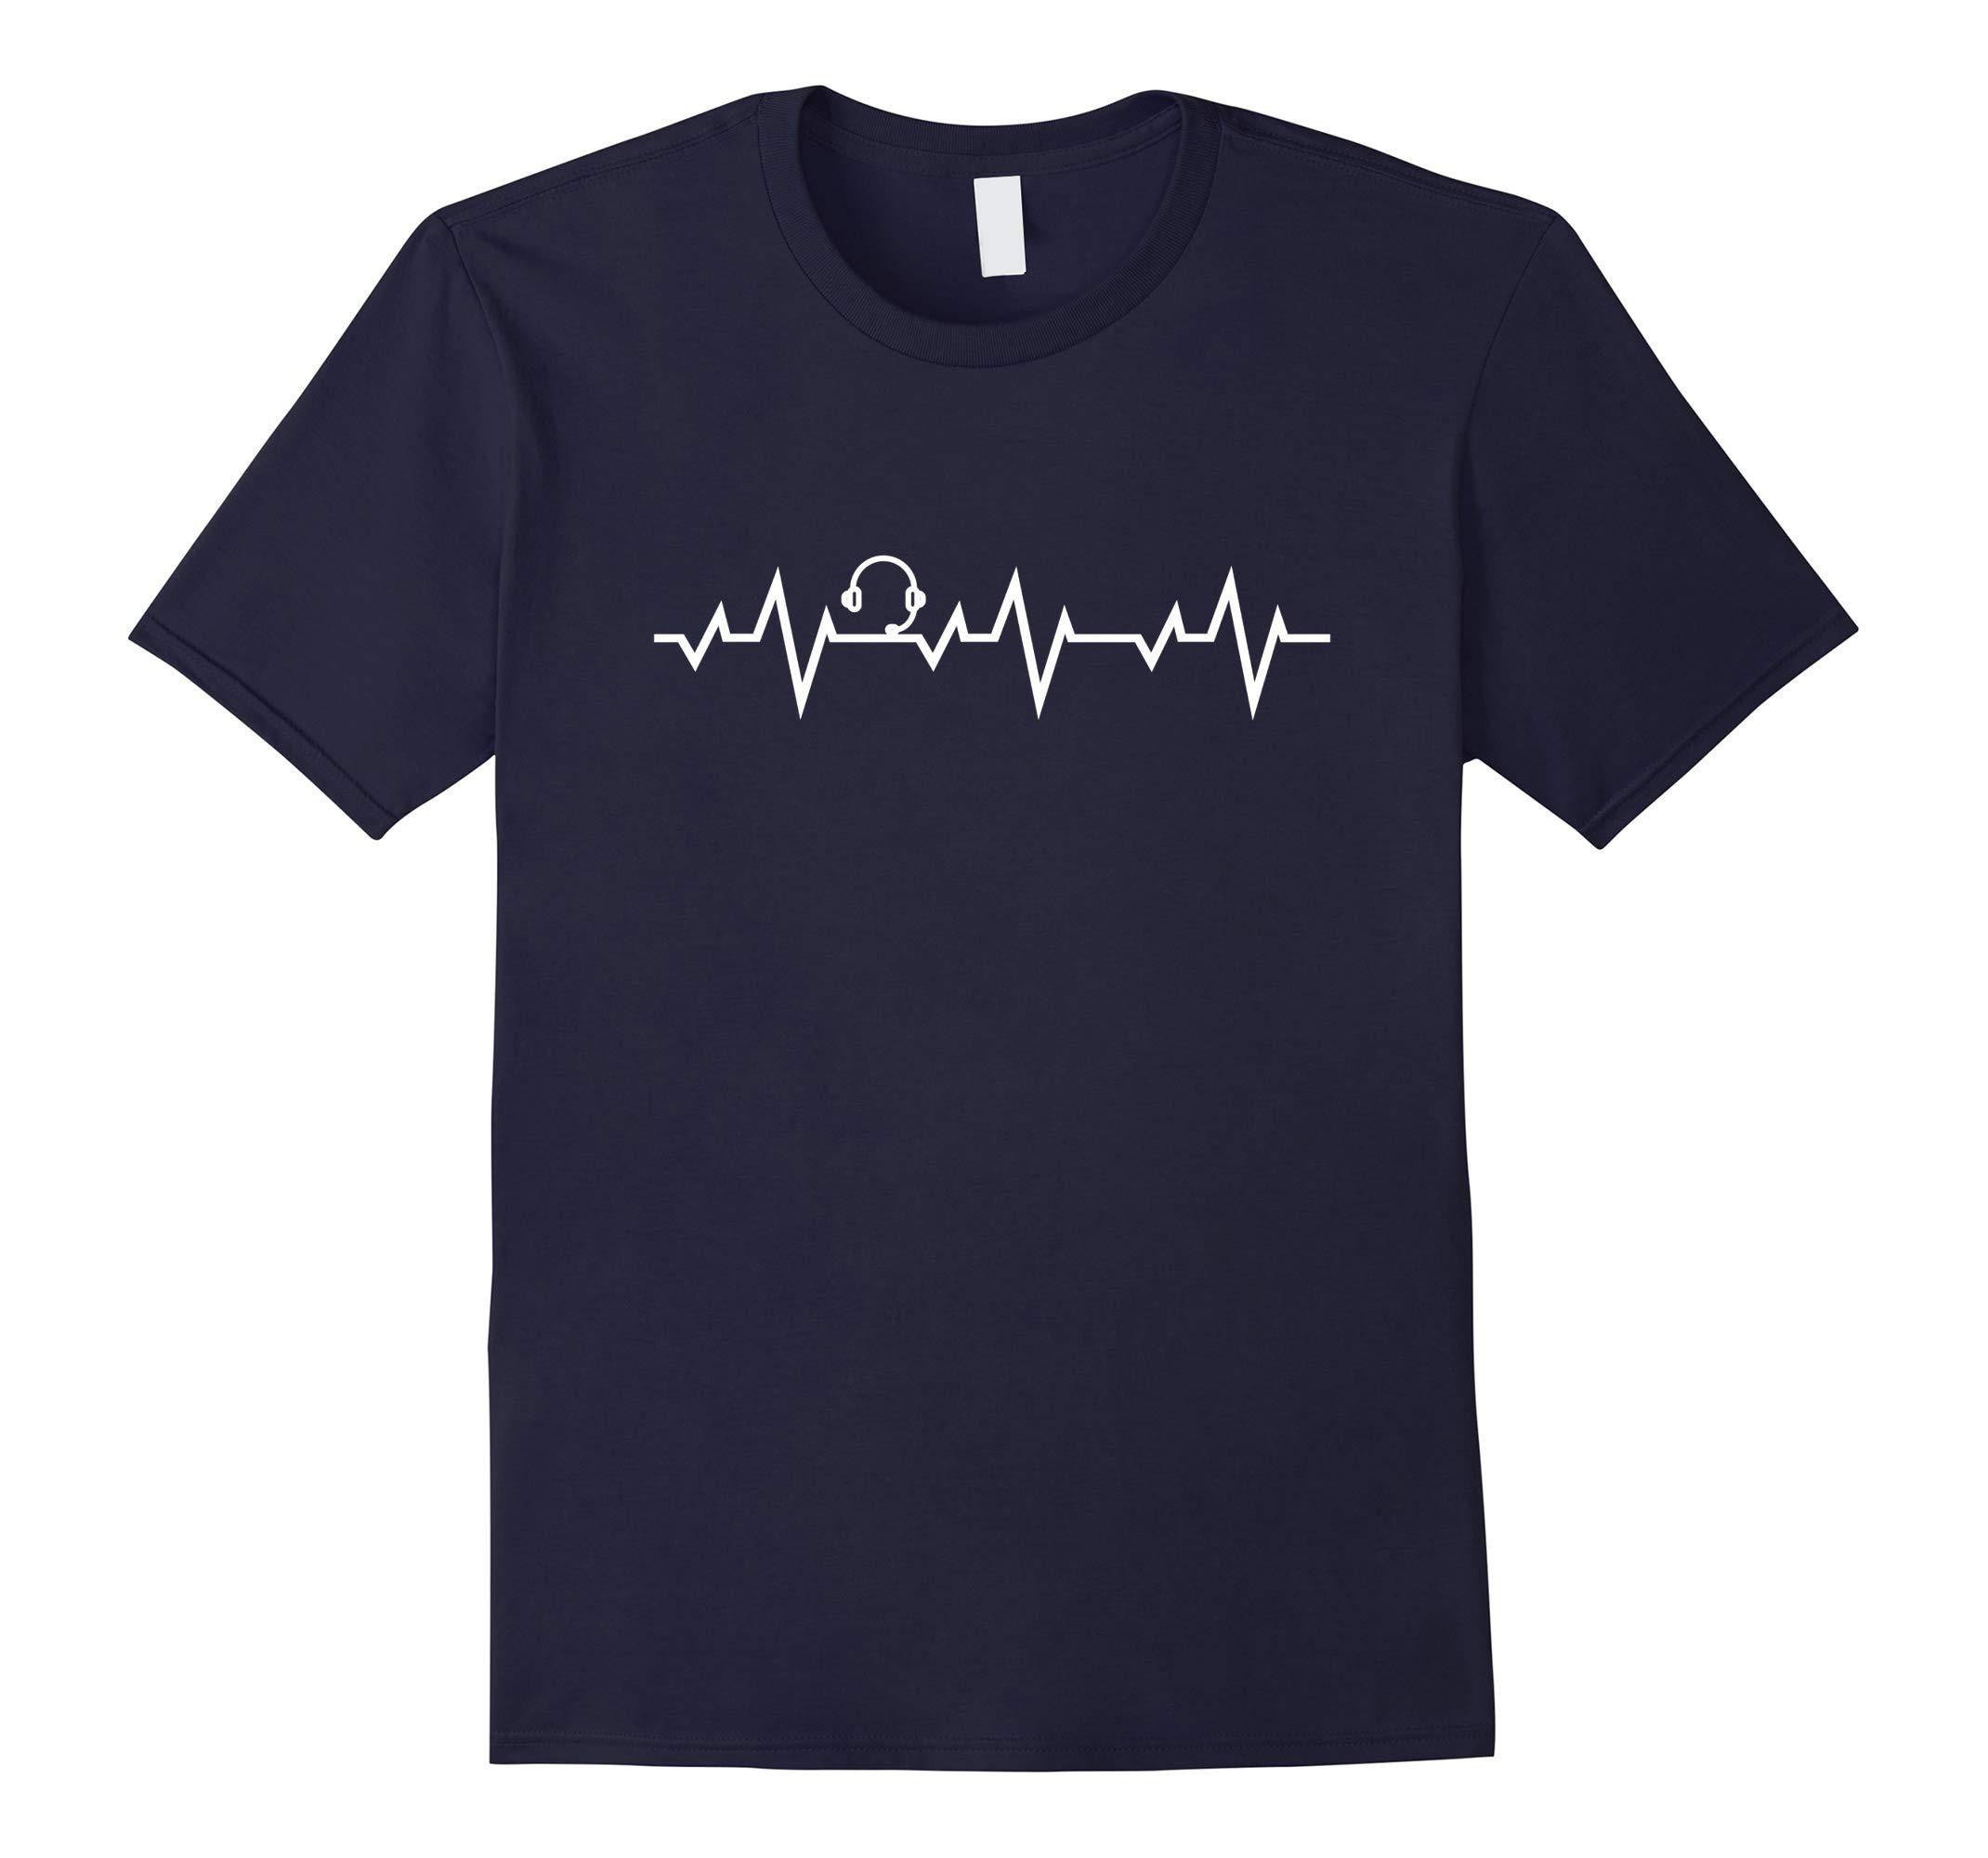 911 Operator Dispatcher Heartbeat First Responder Tshirt-RT